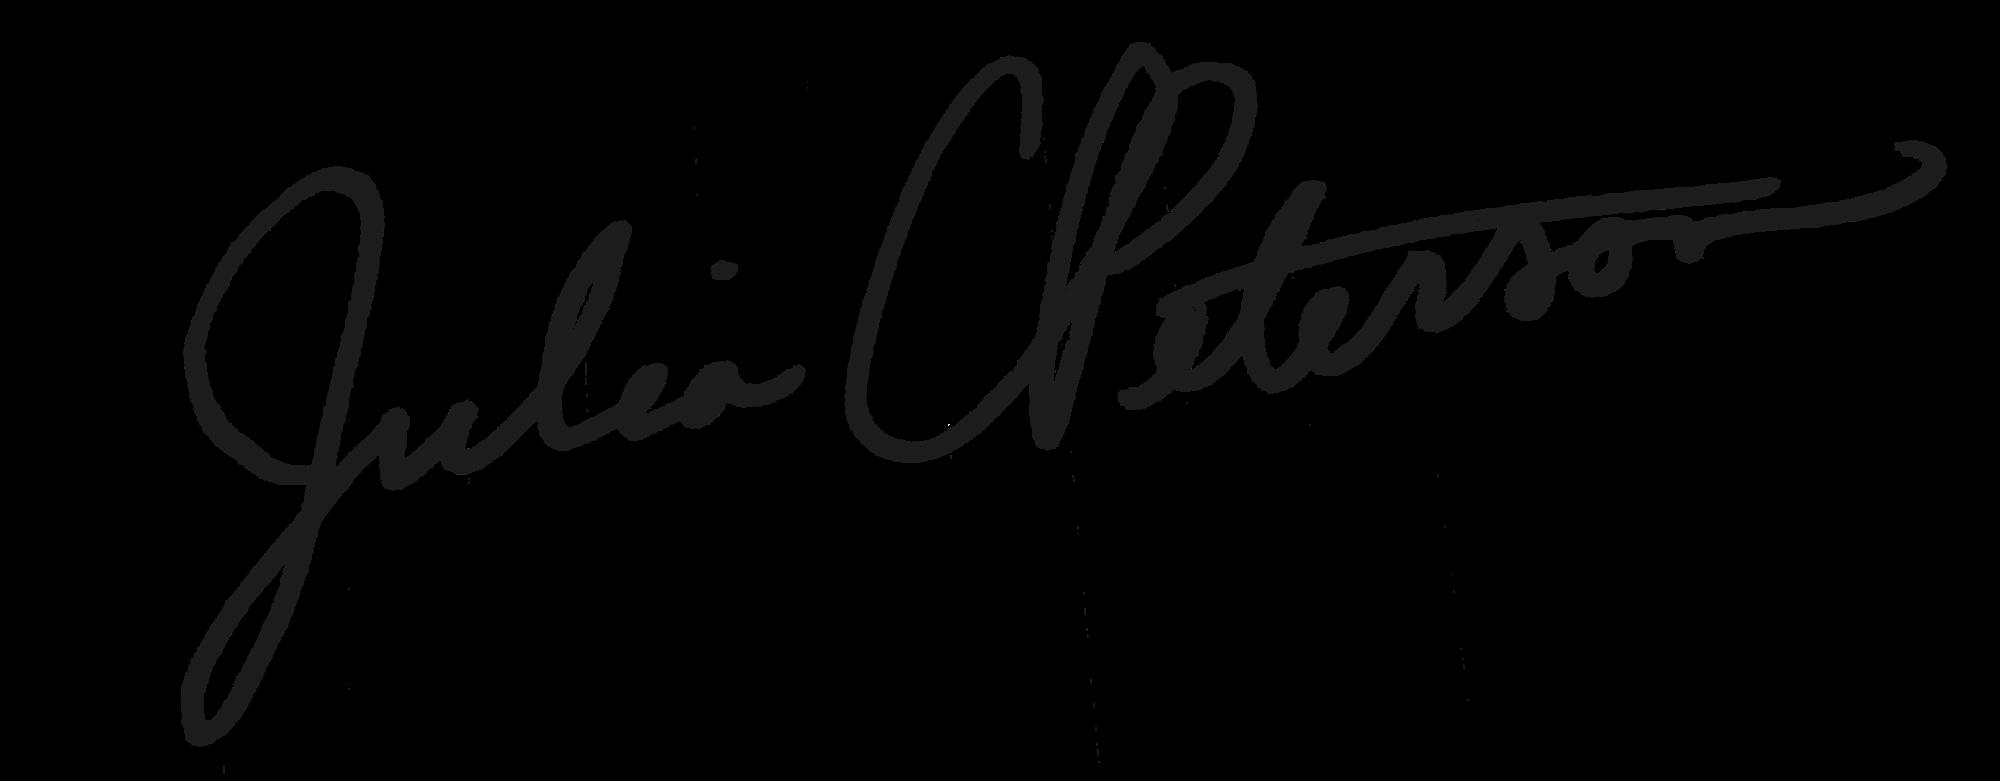 Julia Peterson's Signature